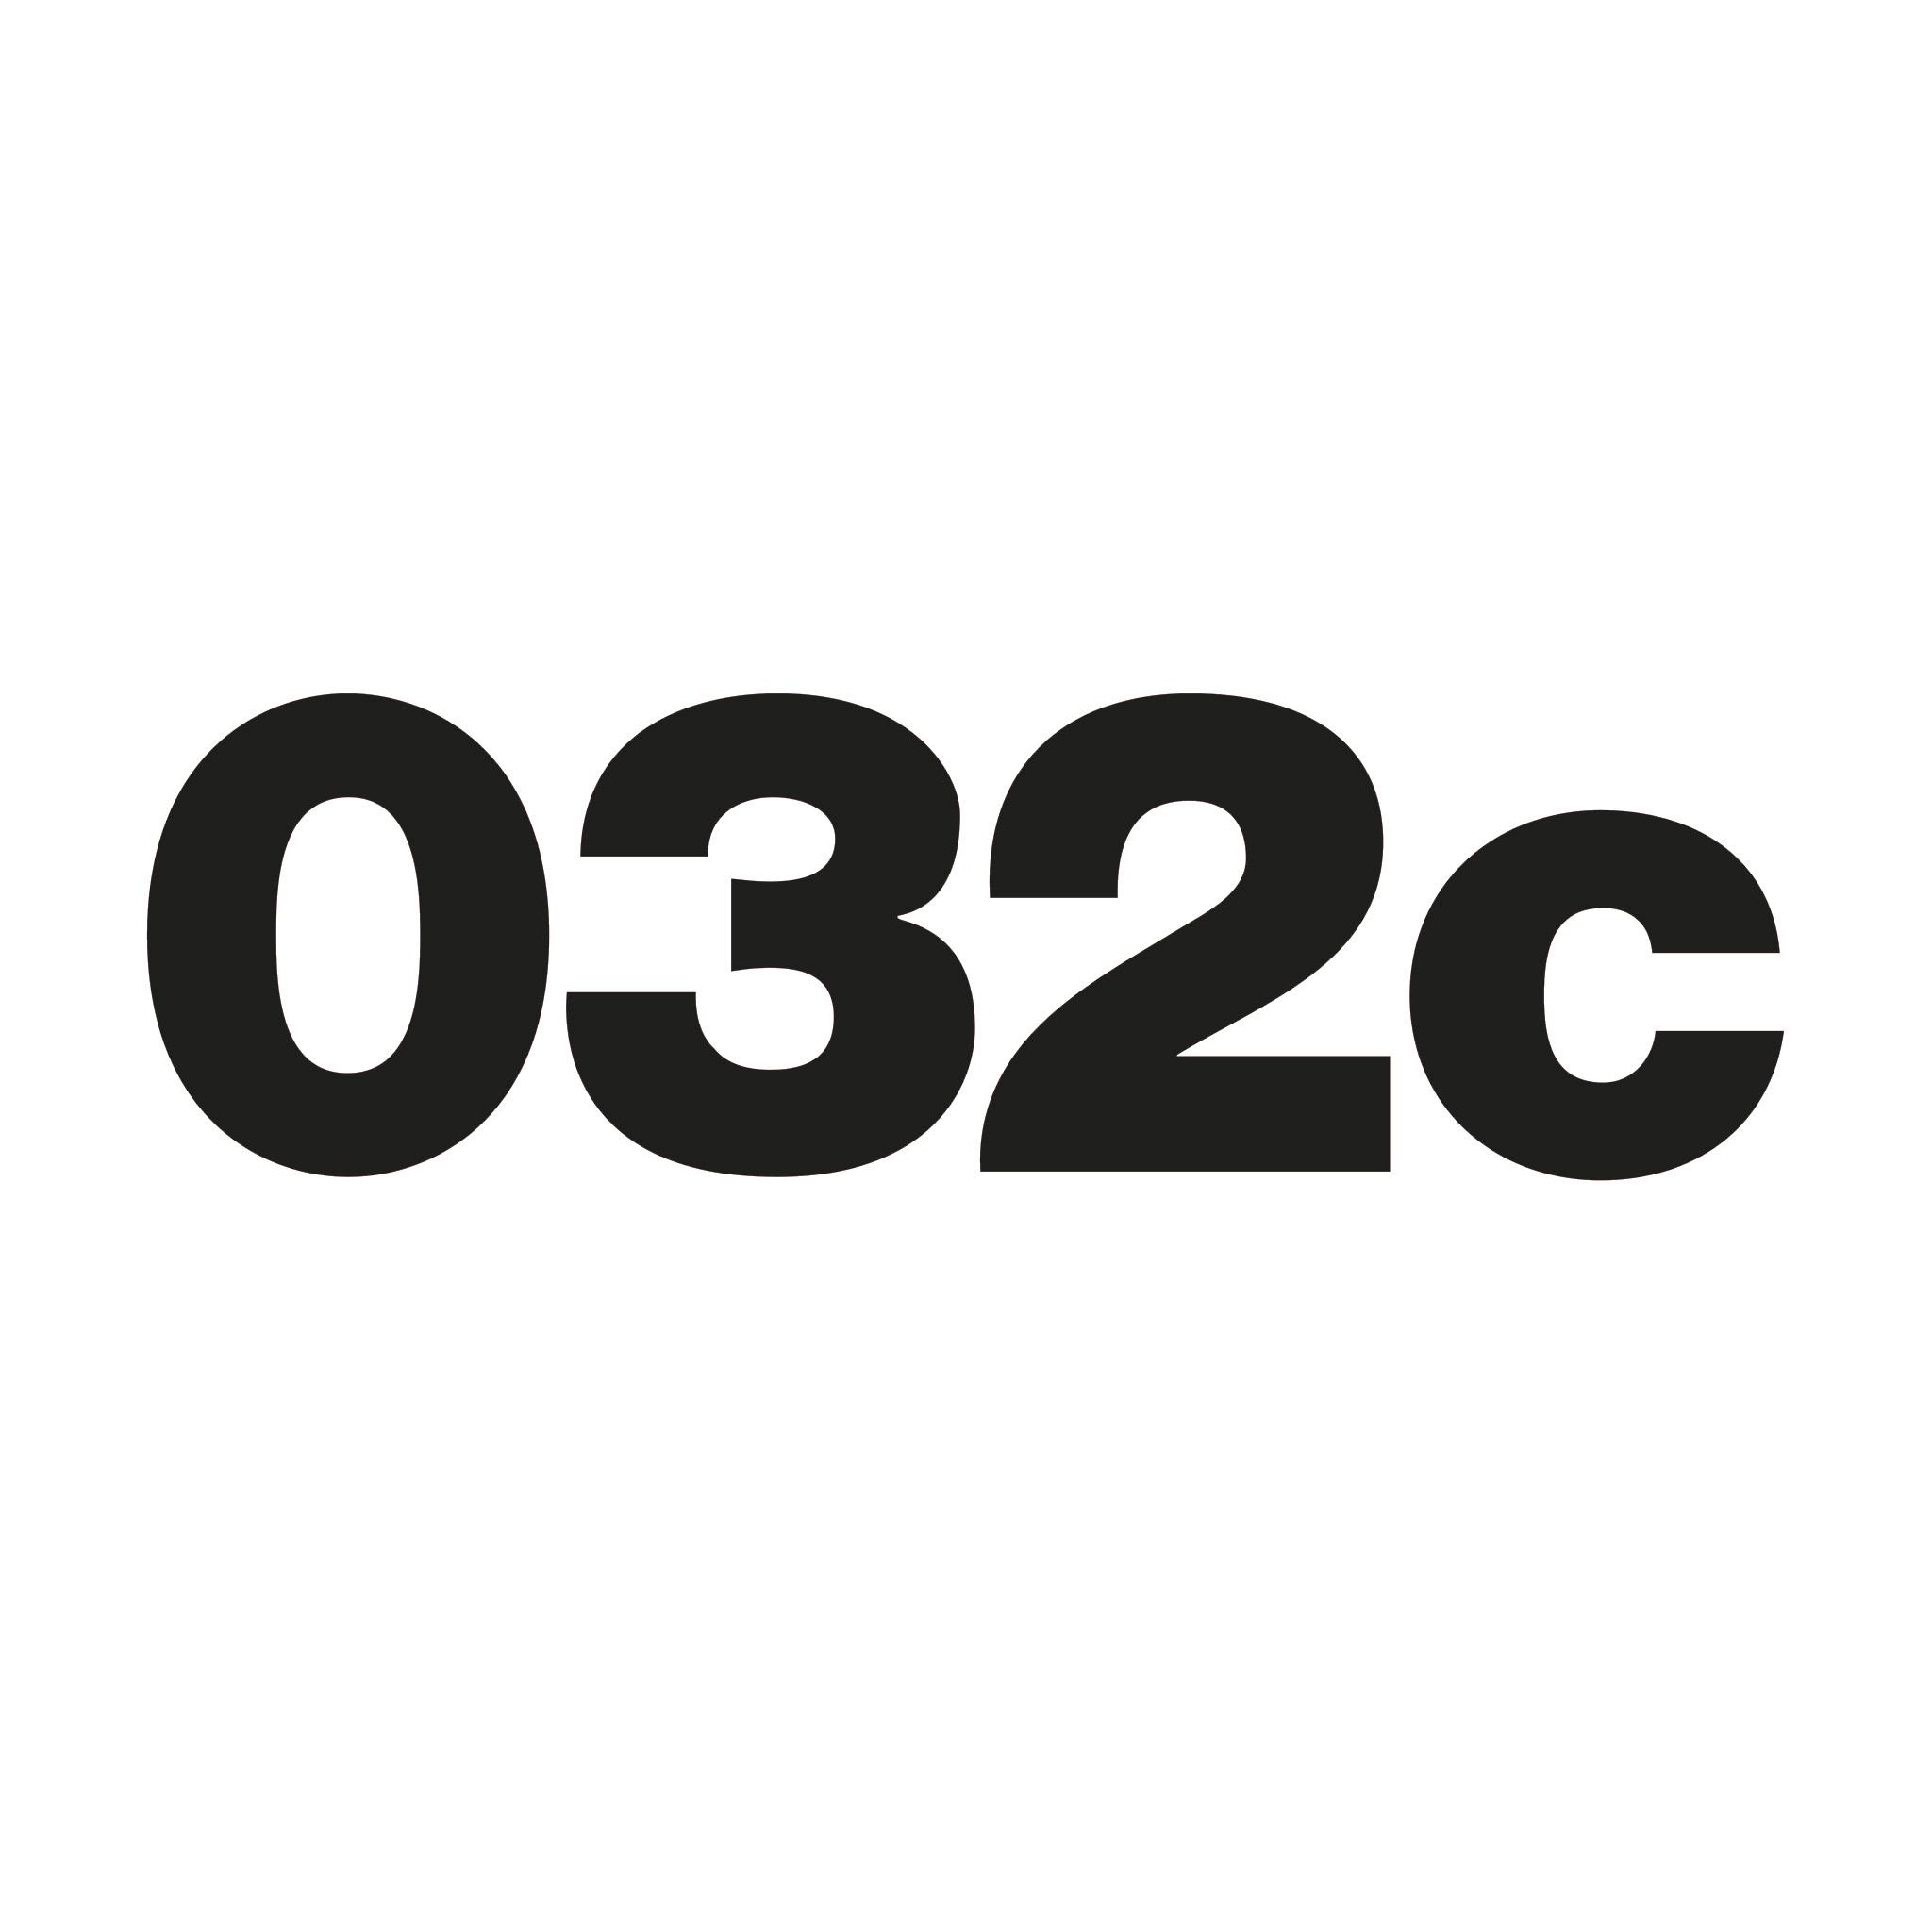 История бренда 032c